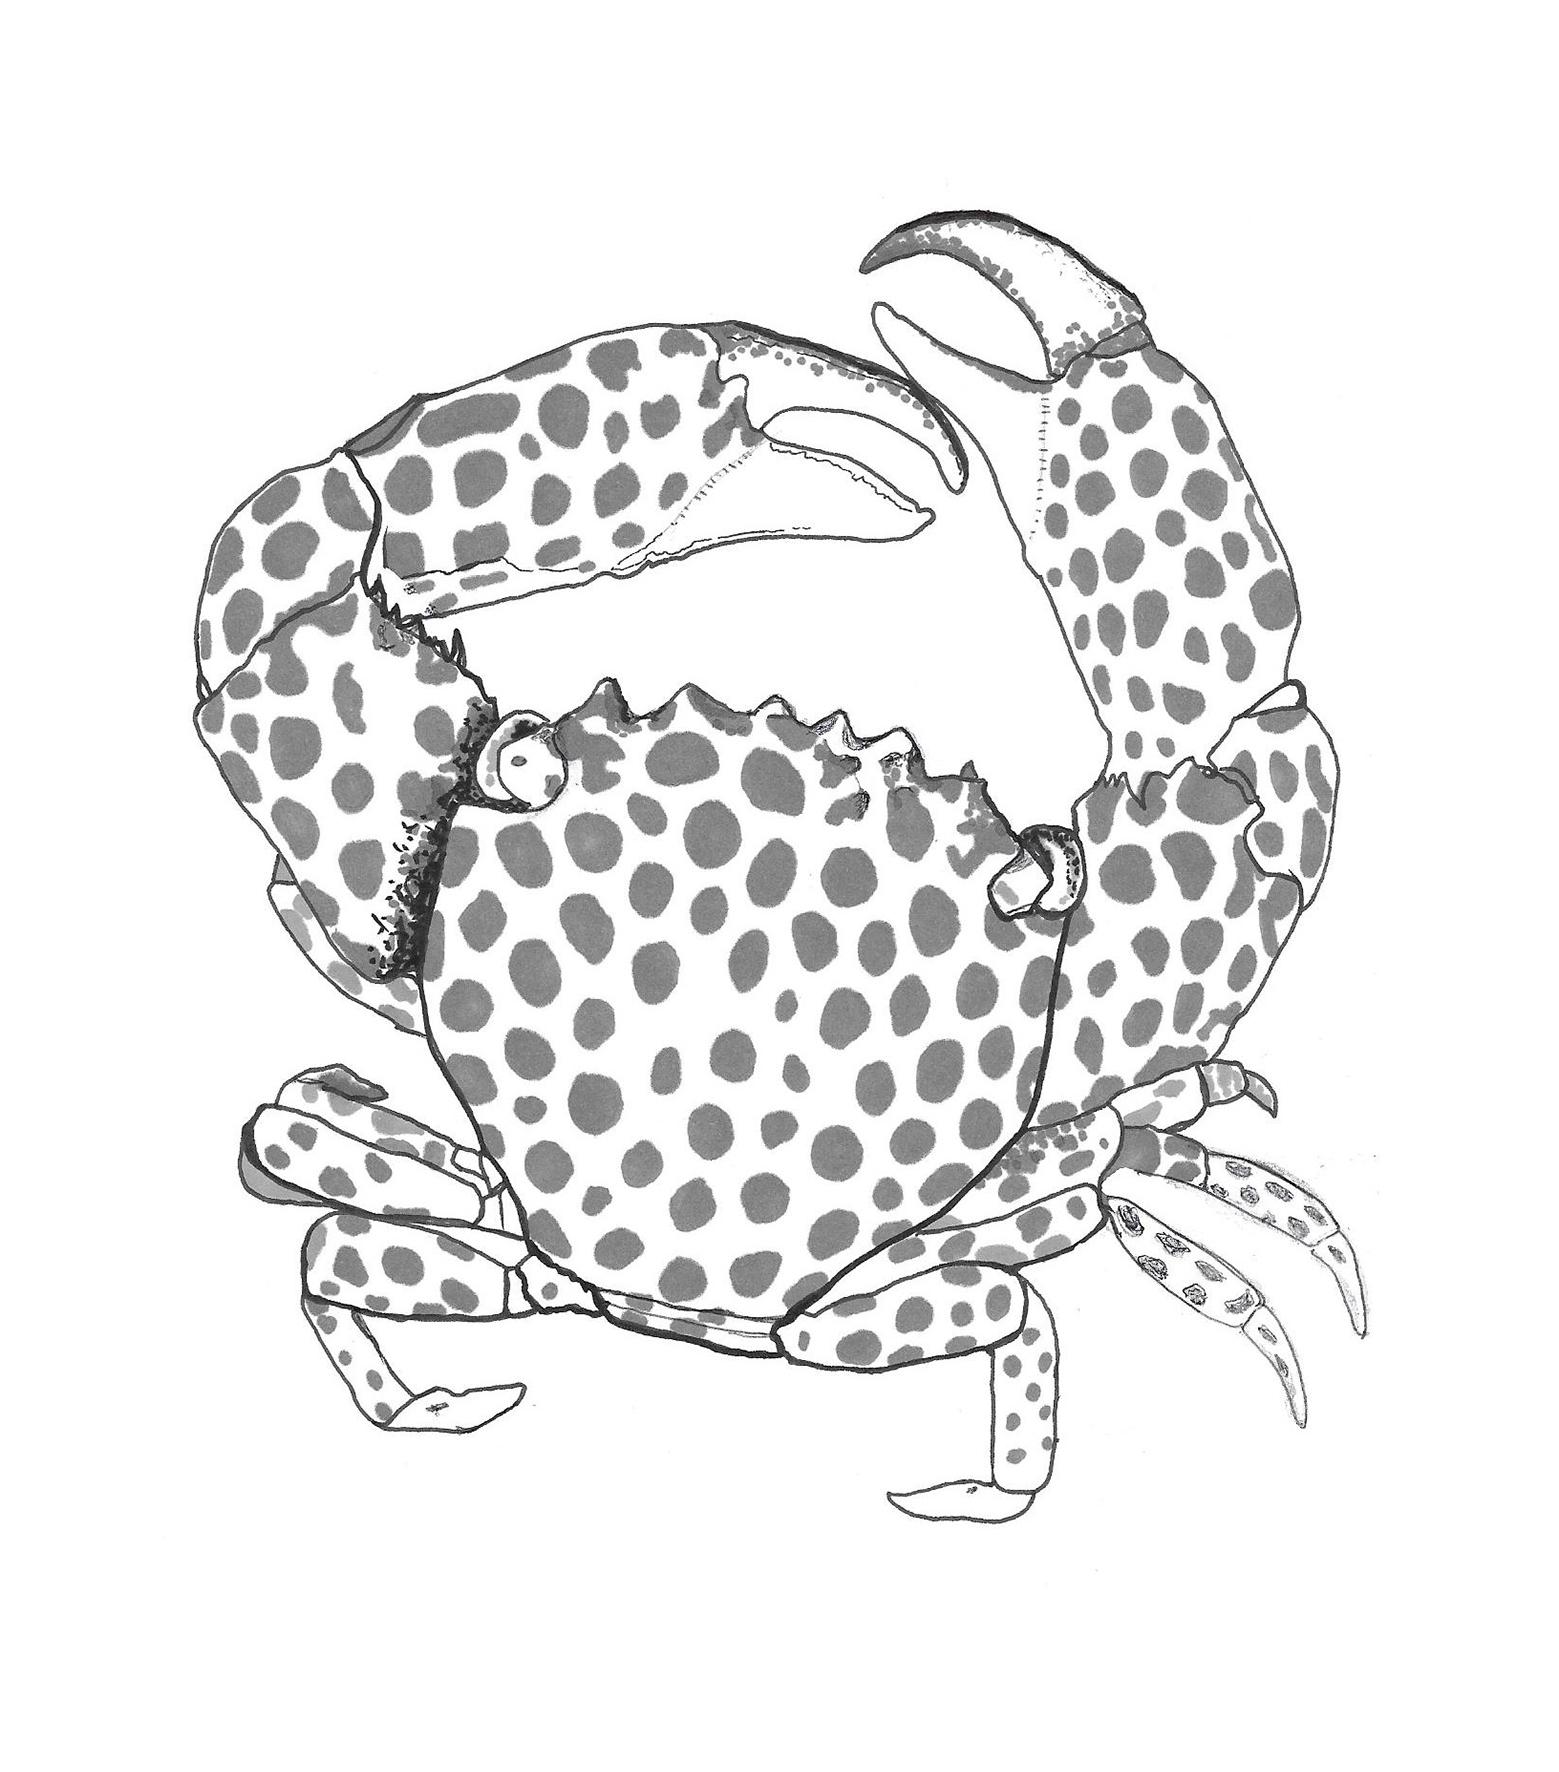 Whiten_crab_illustration_4whiteback.jpg